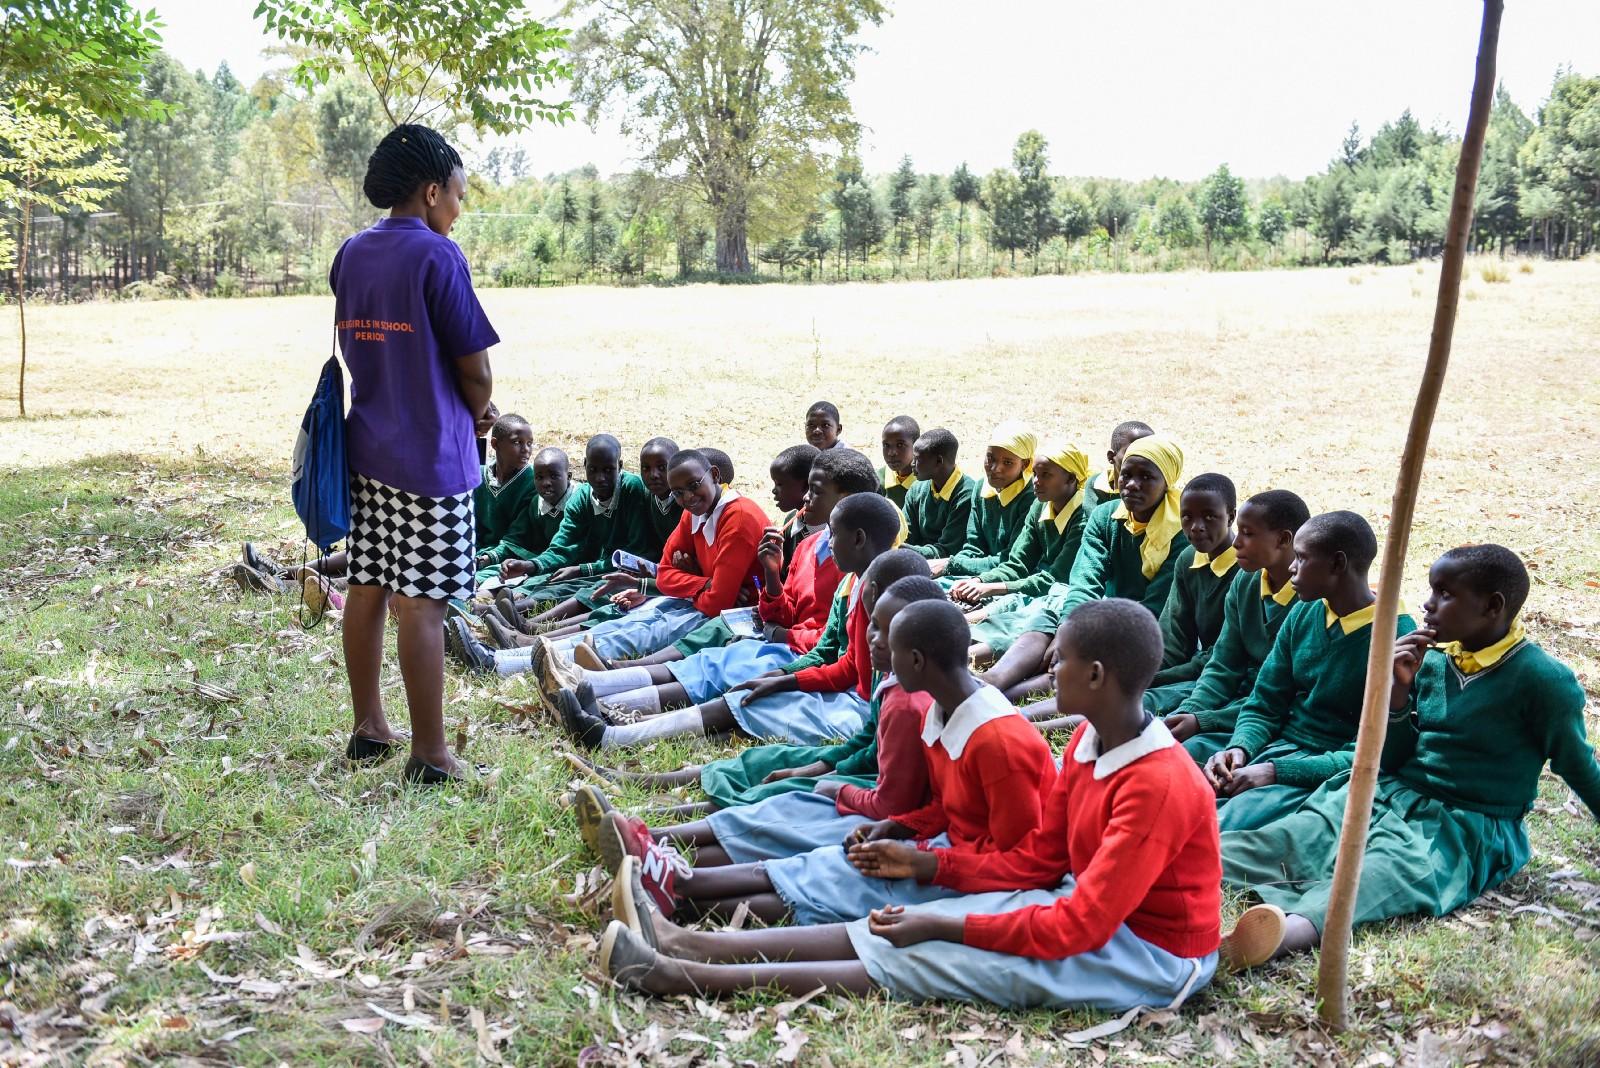 Girls receiving education about menstrual & sexual health in Nairobi, Kenya